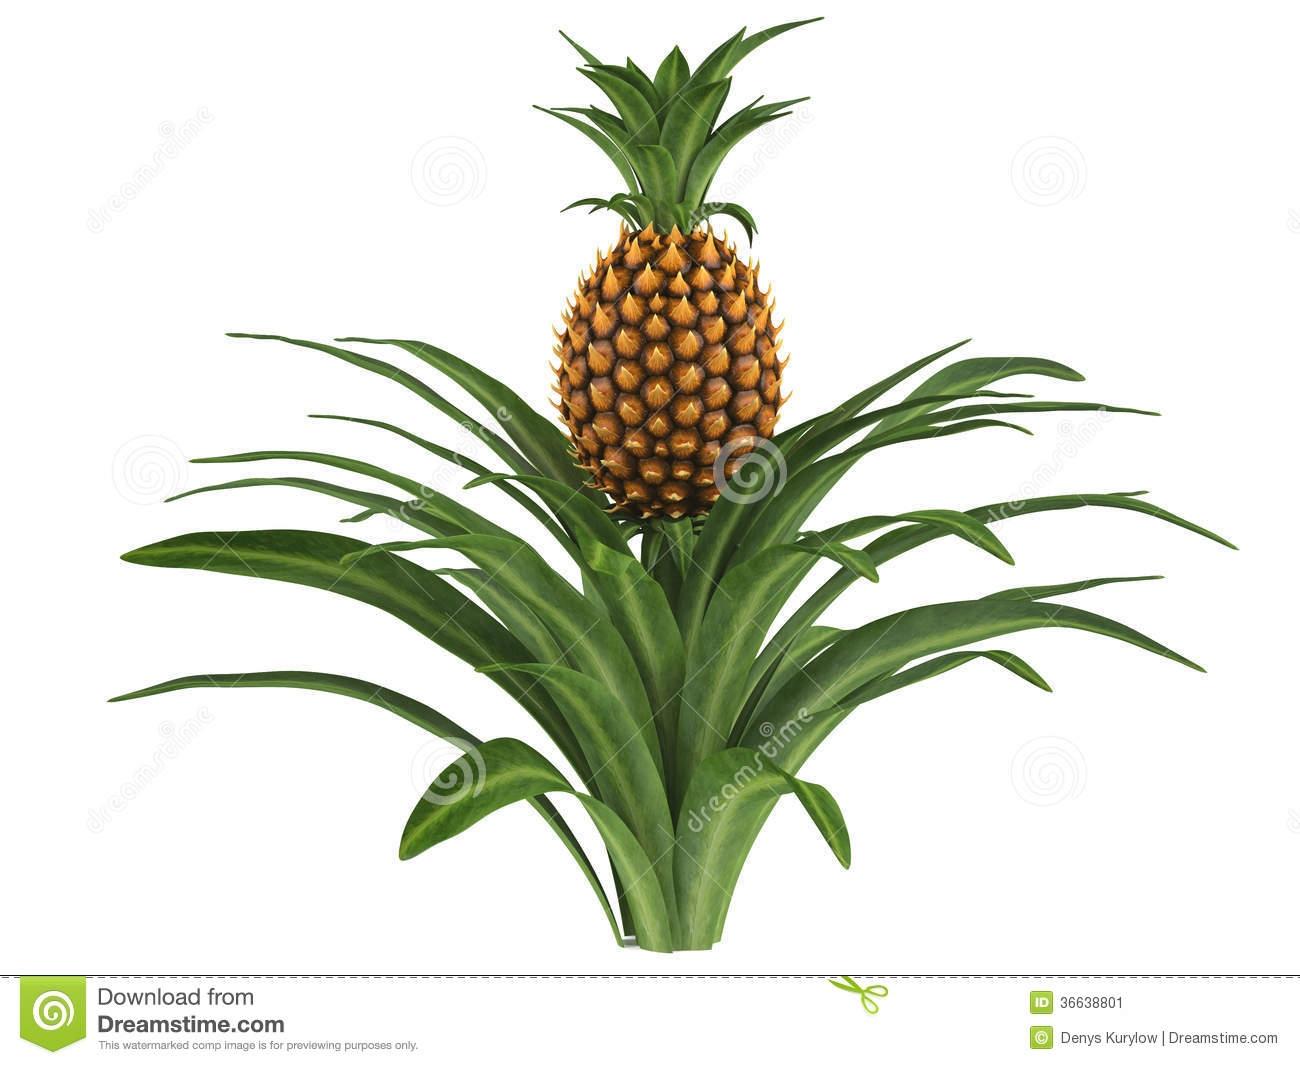 Plant clipart pine apple Csp14058102 Clipart Pineapple Pineapple plant